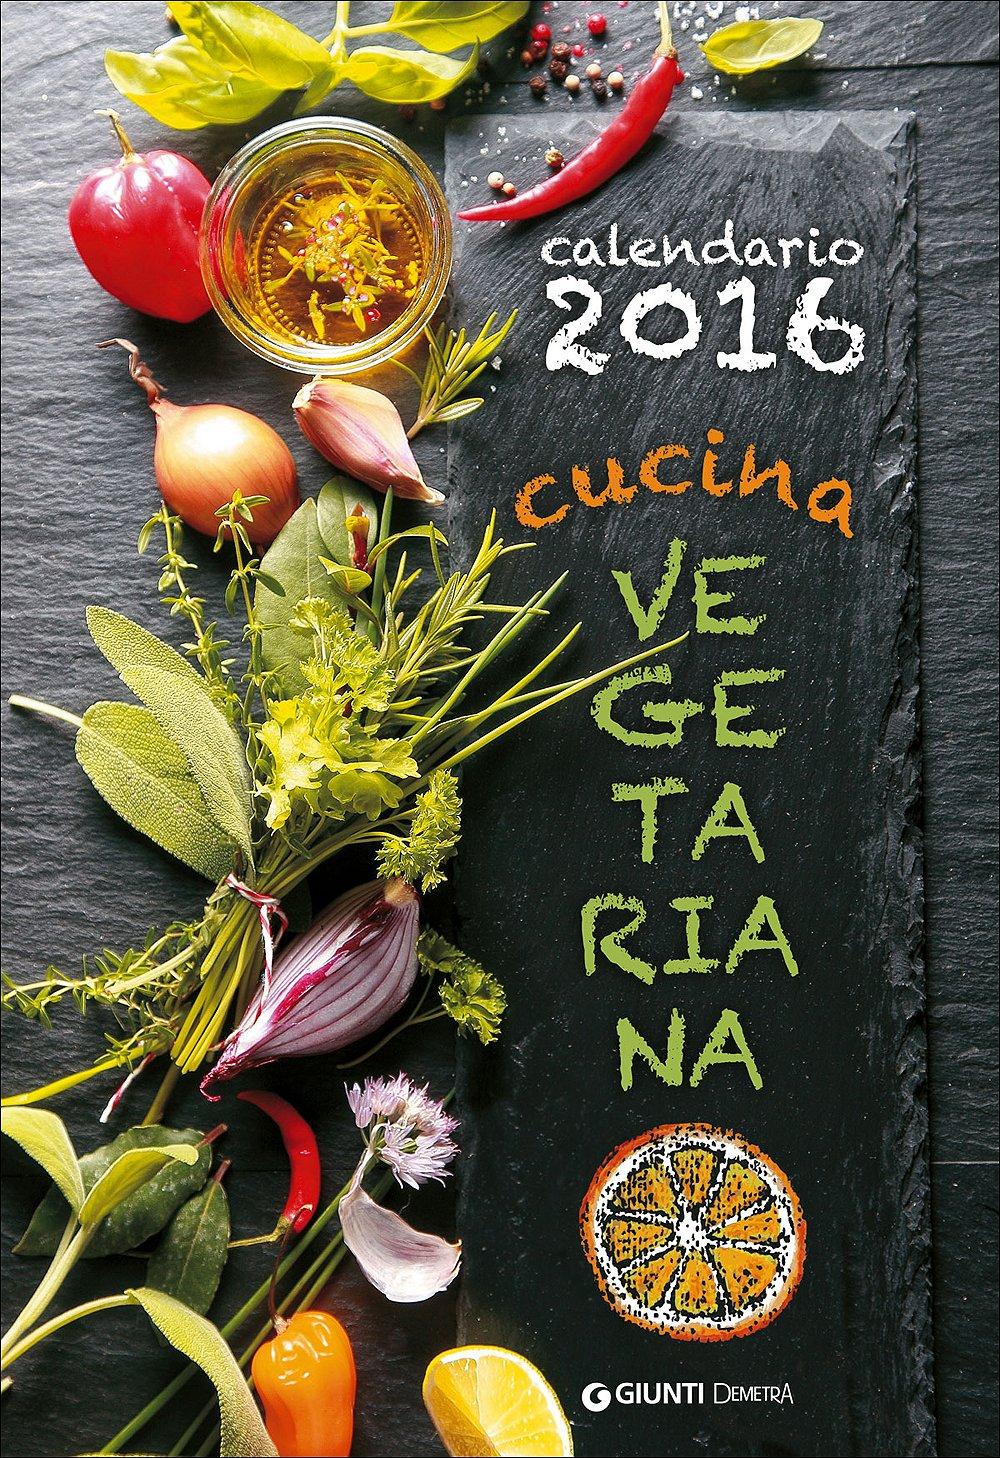 Cucina vegetariana. Calendario 2016